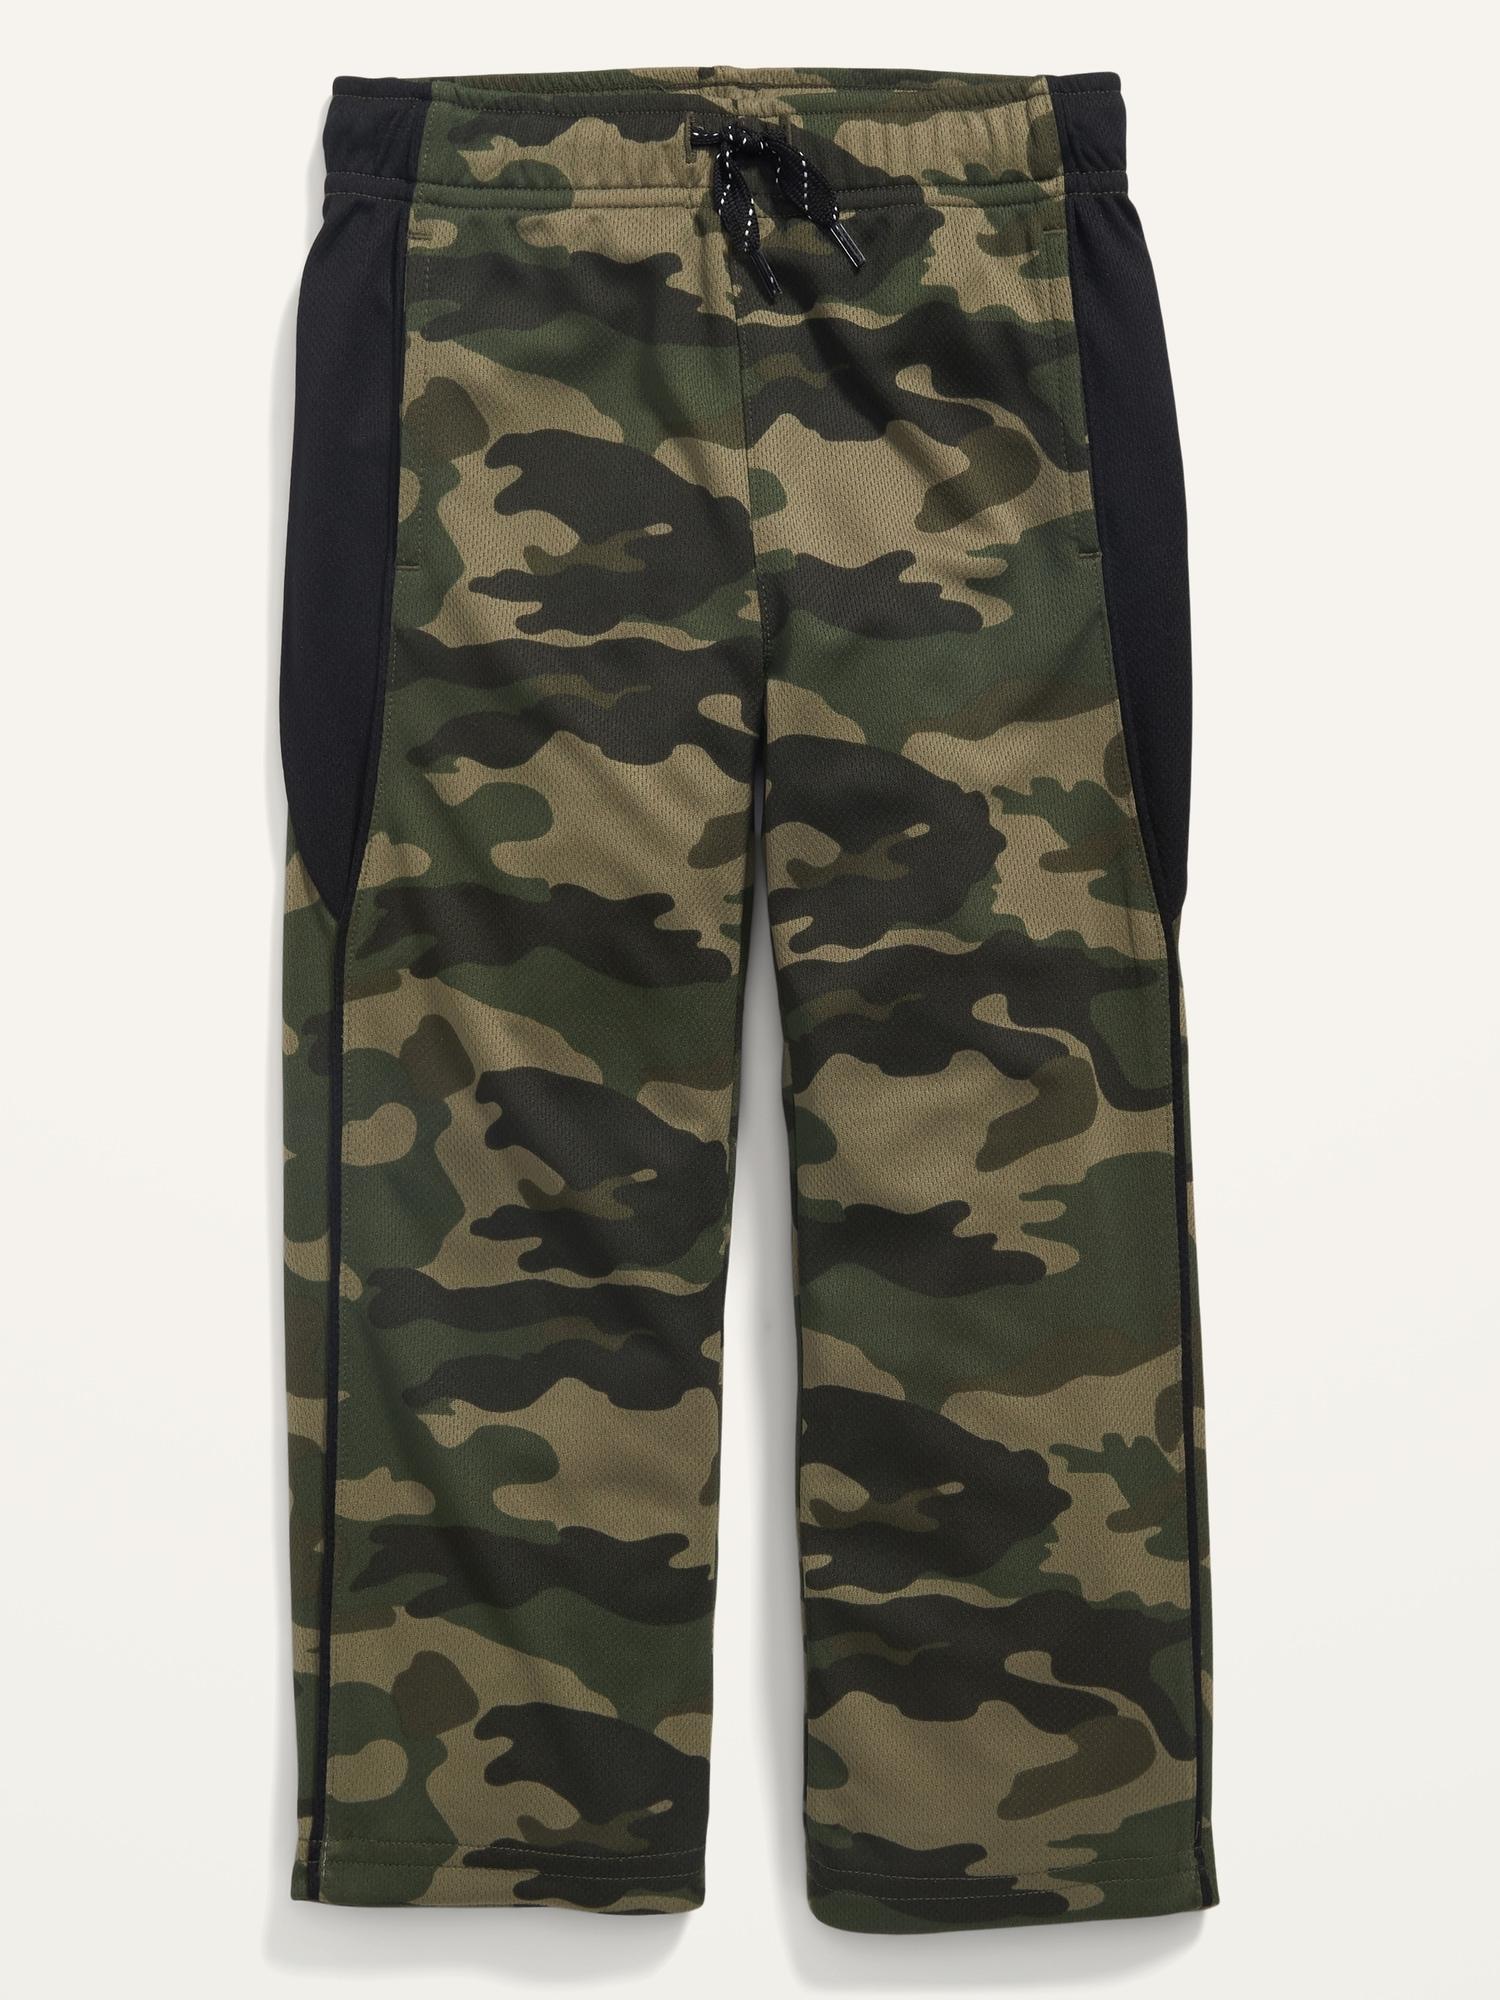 Old Navy Toddler Boys Drawstring Mesh Performance Pants (Camo) $4.50, Raglan-Sleeve Tee $3.73, Karate Rib-Waist Twill Shorts $6 + Free store pickup